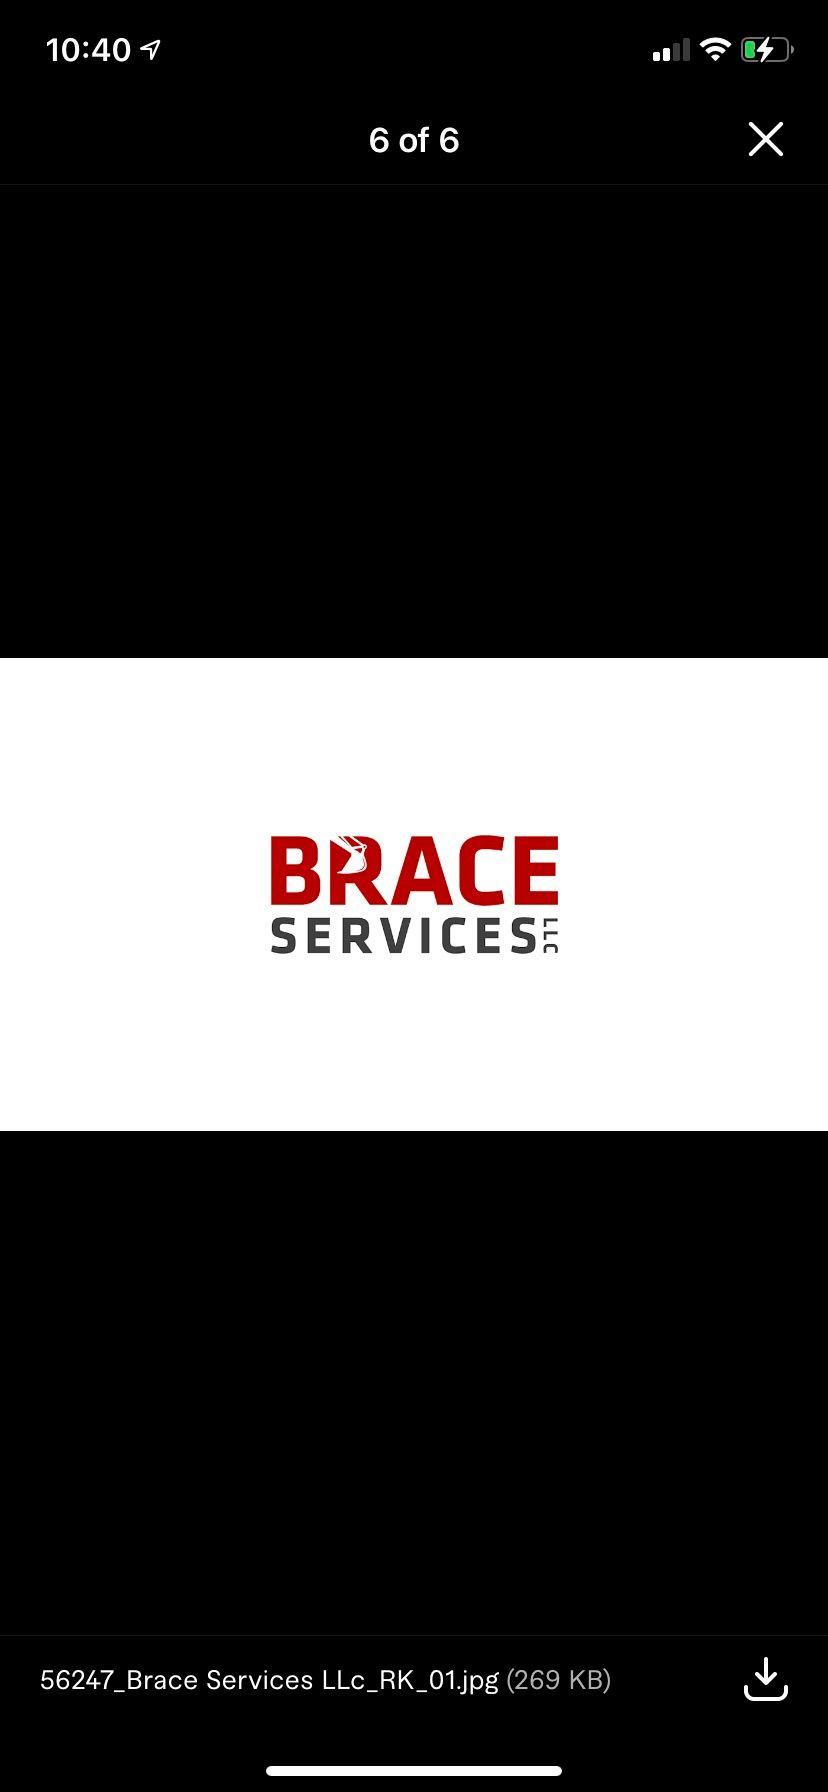 Brace Services llc